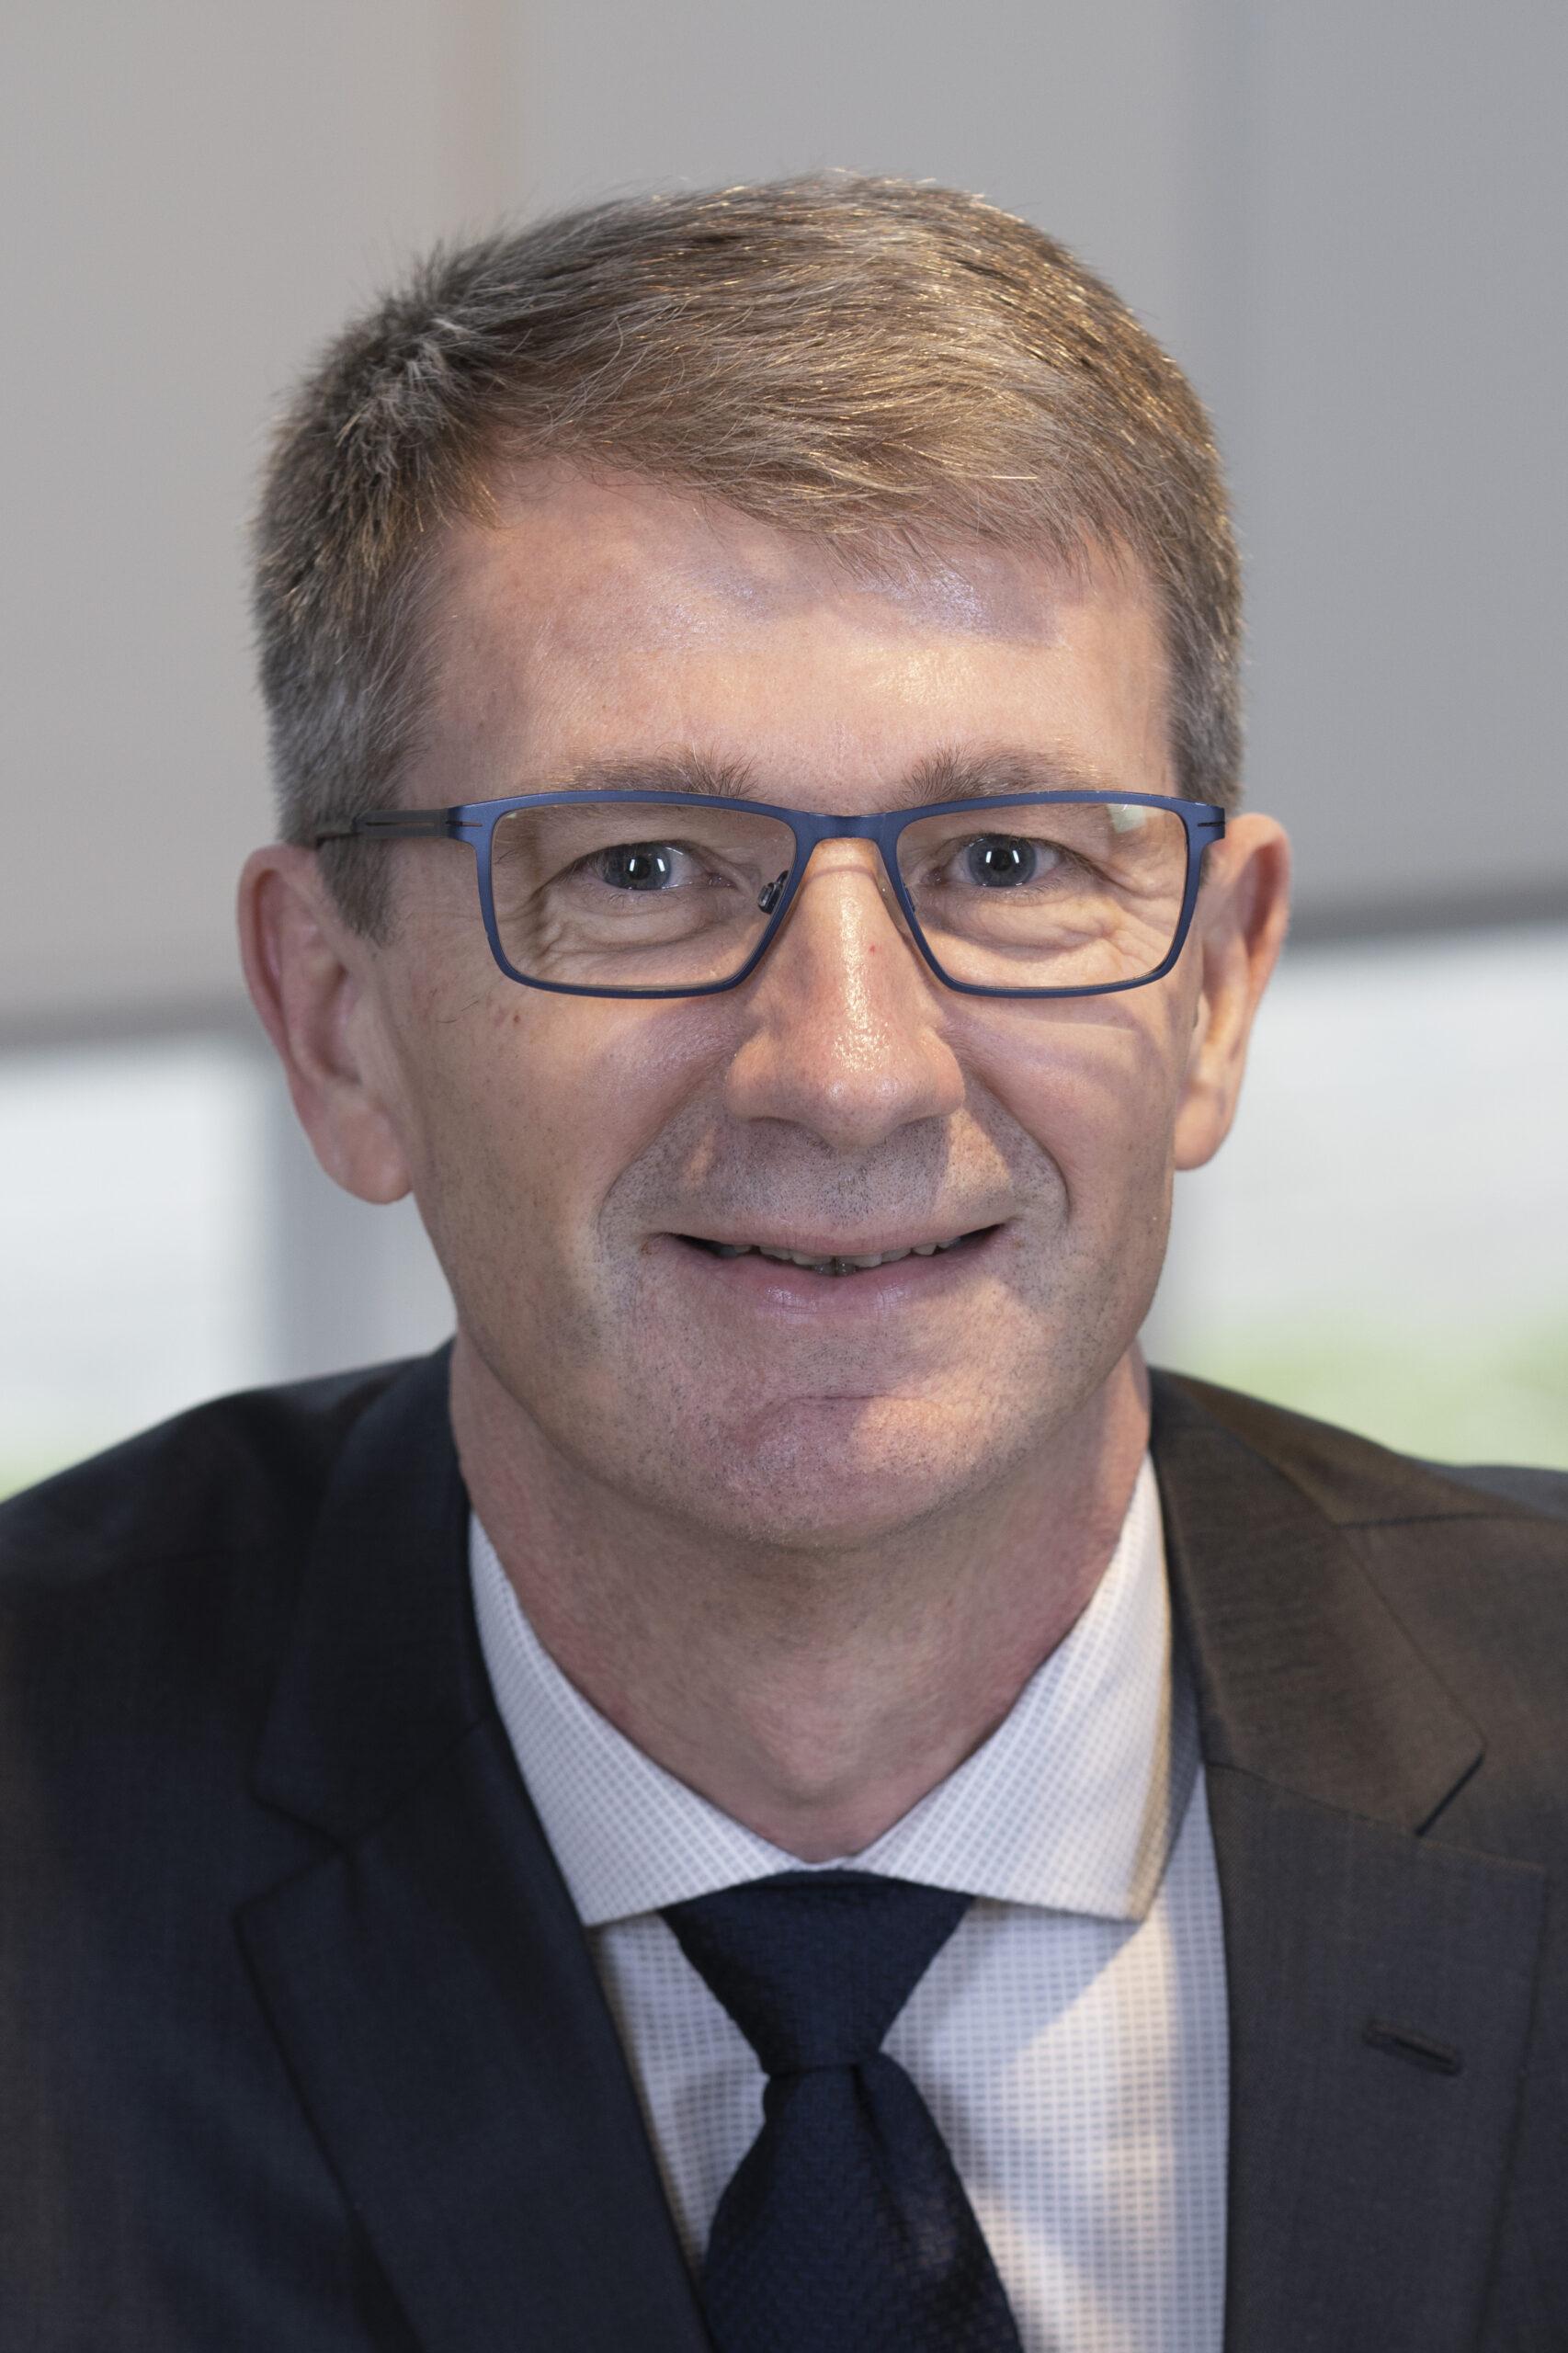 Claus Melgaard